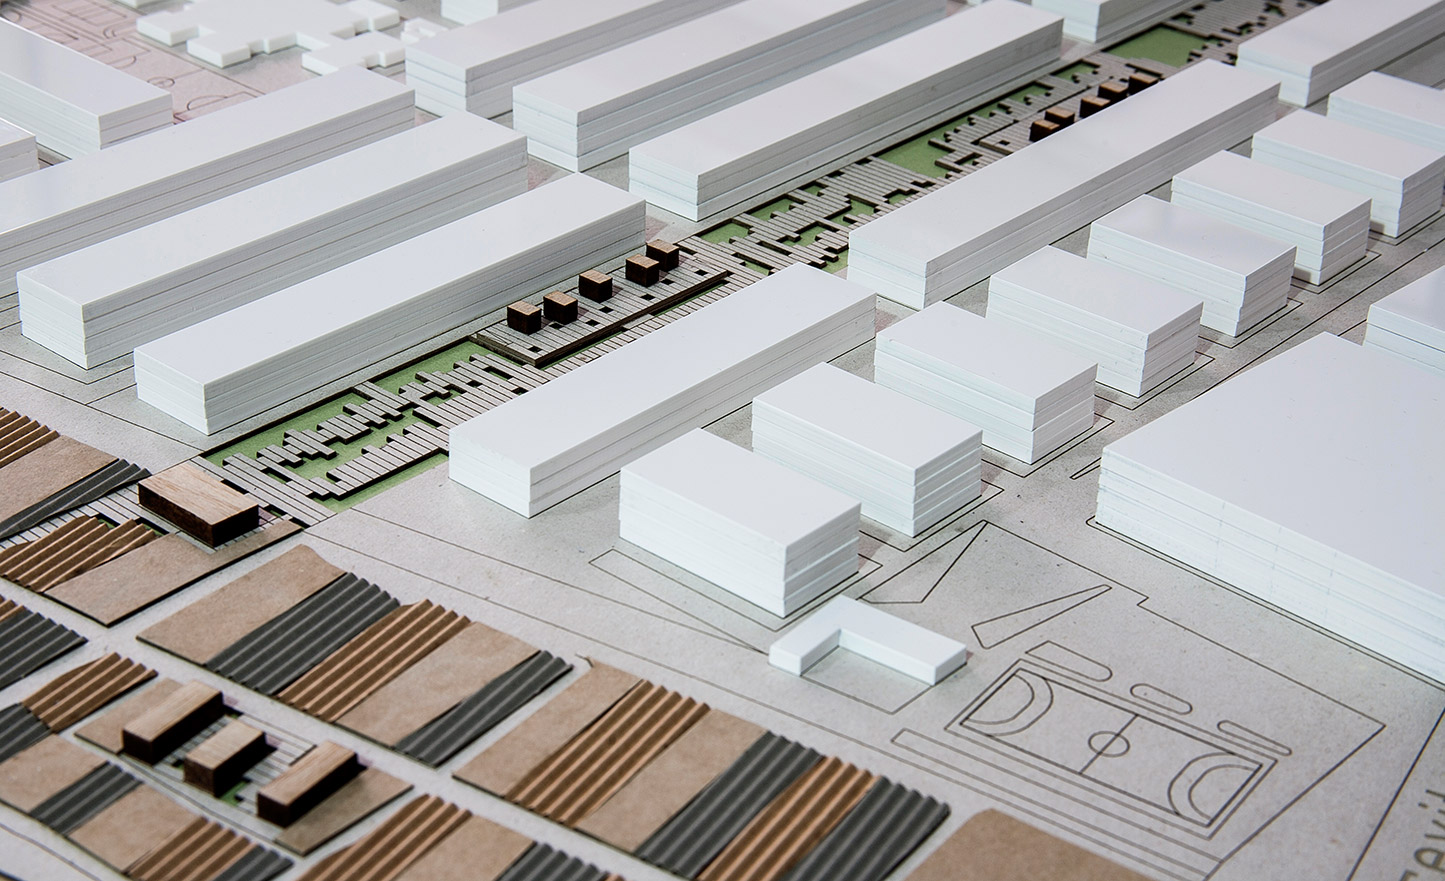 maqueta-arquitectura-valencia-pfc-tfg-UPV-huerta-arquiayuda (5)